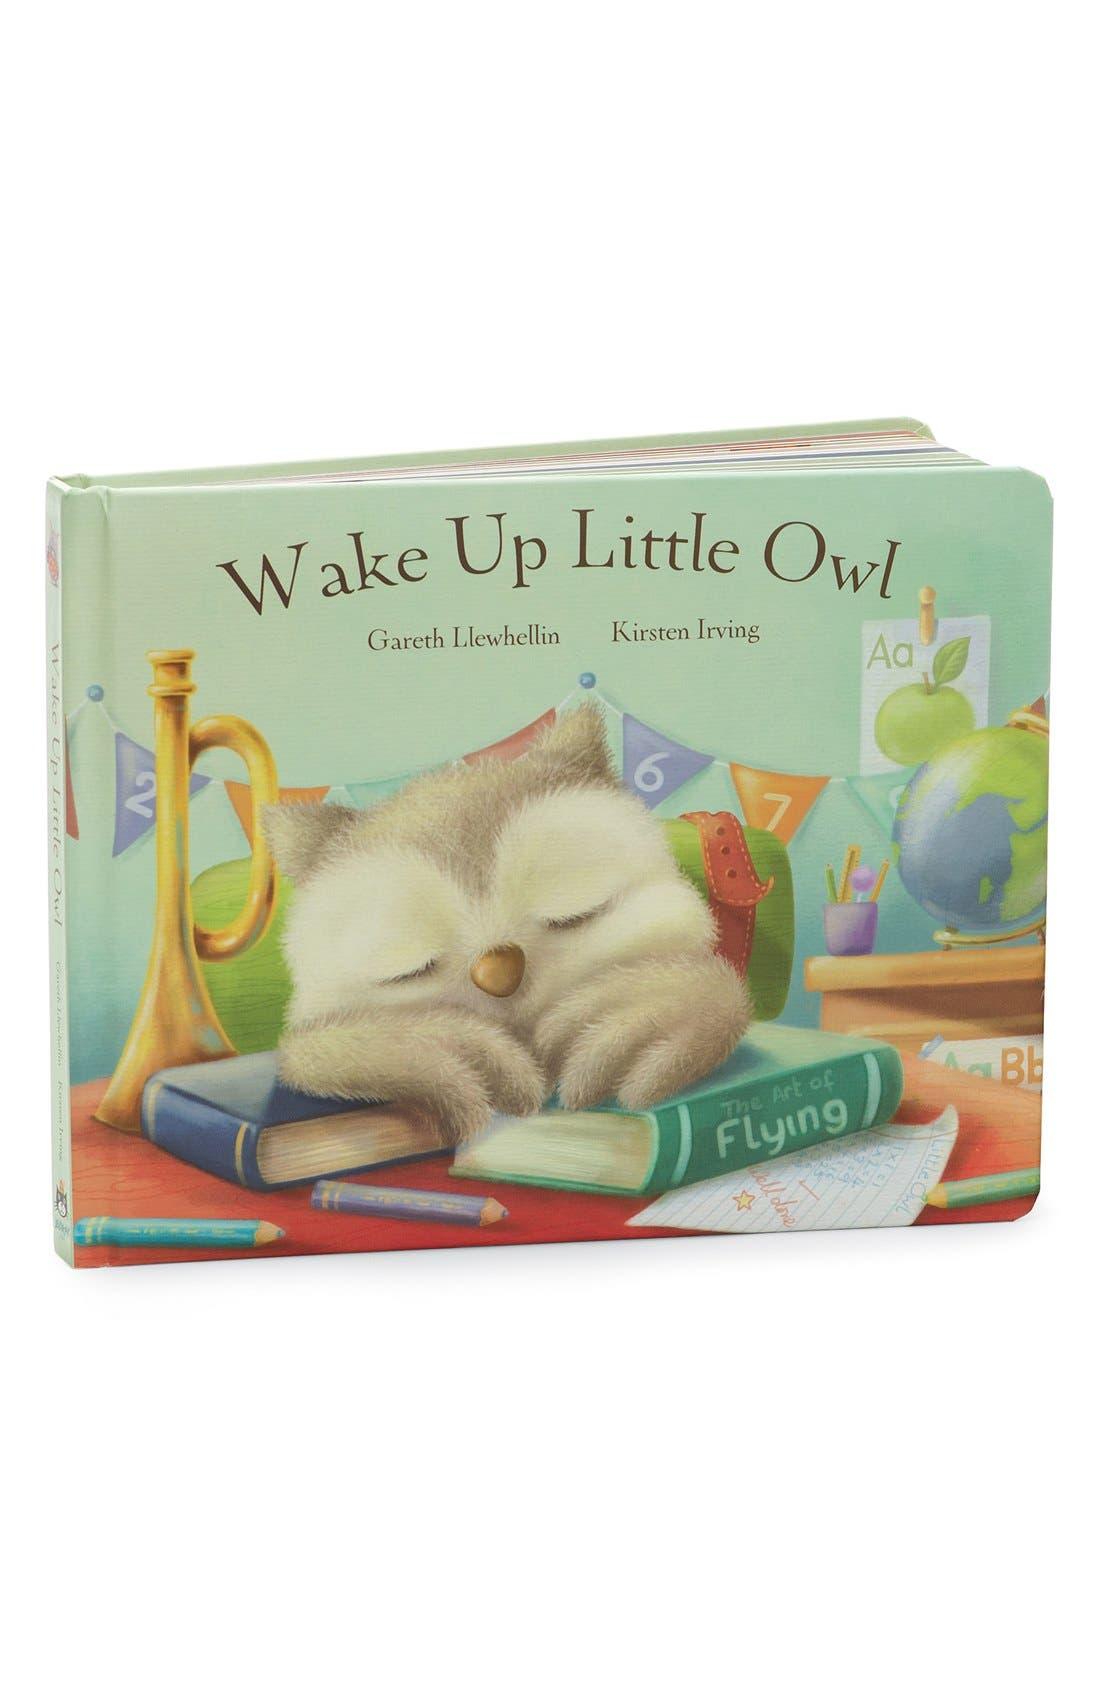 'Wake Up Little Owl' Board Book